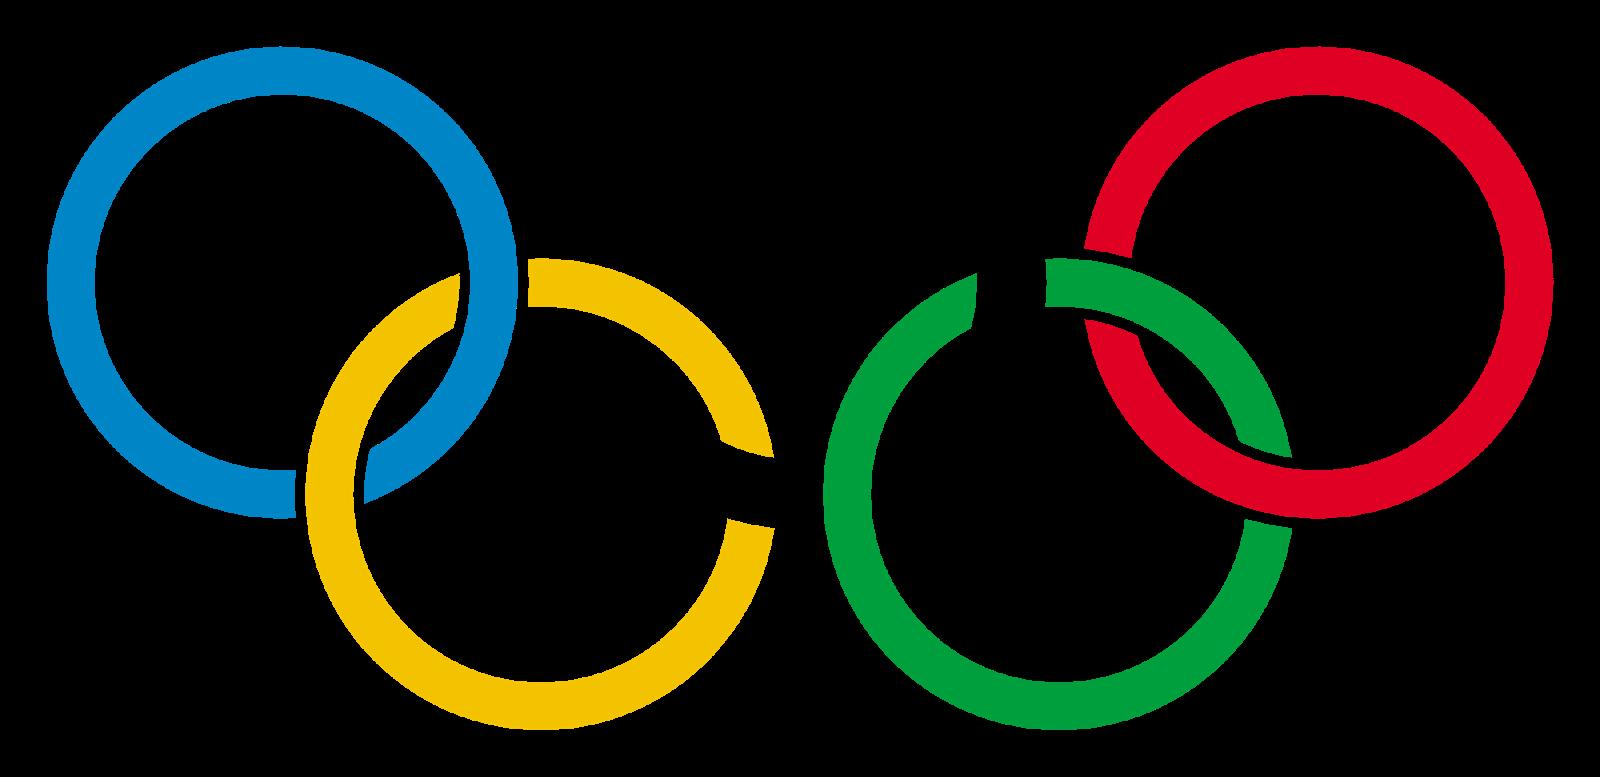 2014 Olympic hockey game